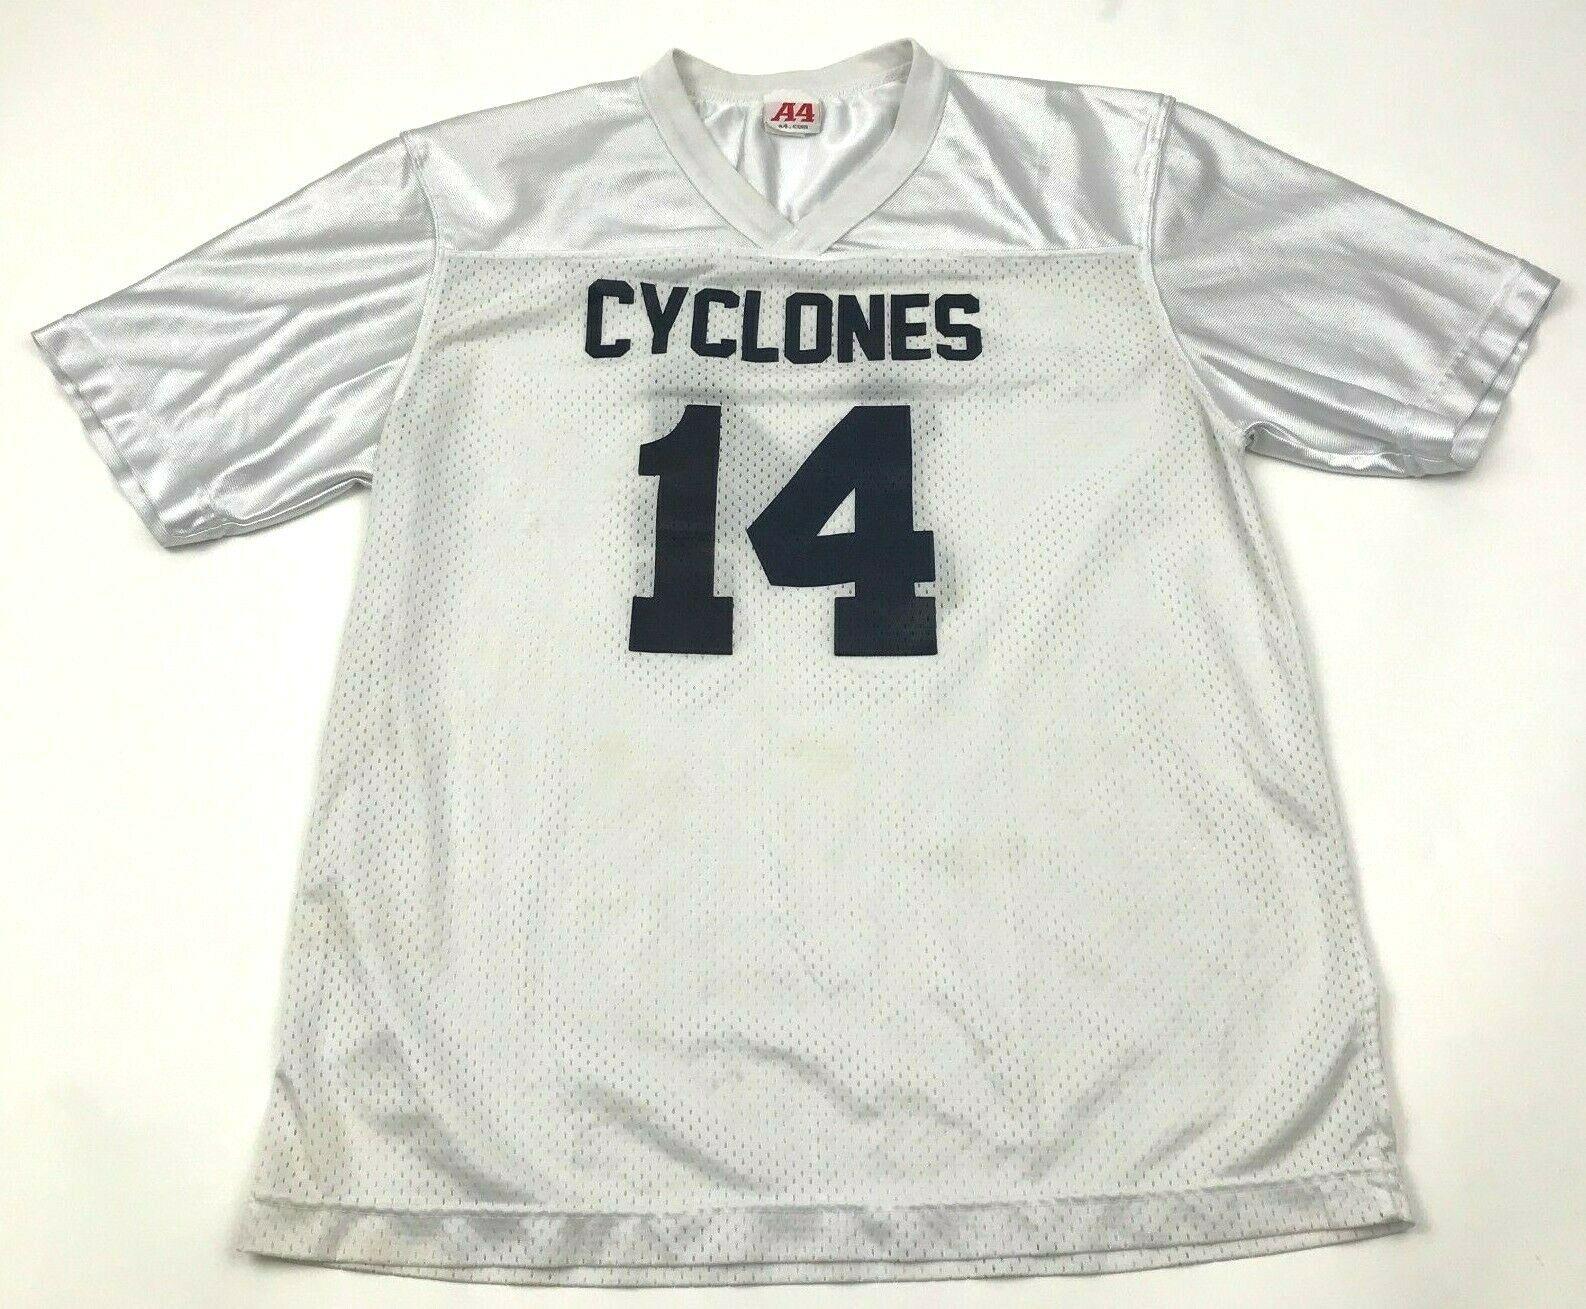 VINTAGE Cyclones Jersey Shirt Size Medium M White Blue Short Sleeve V-Neck 90's